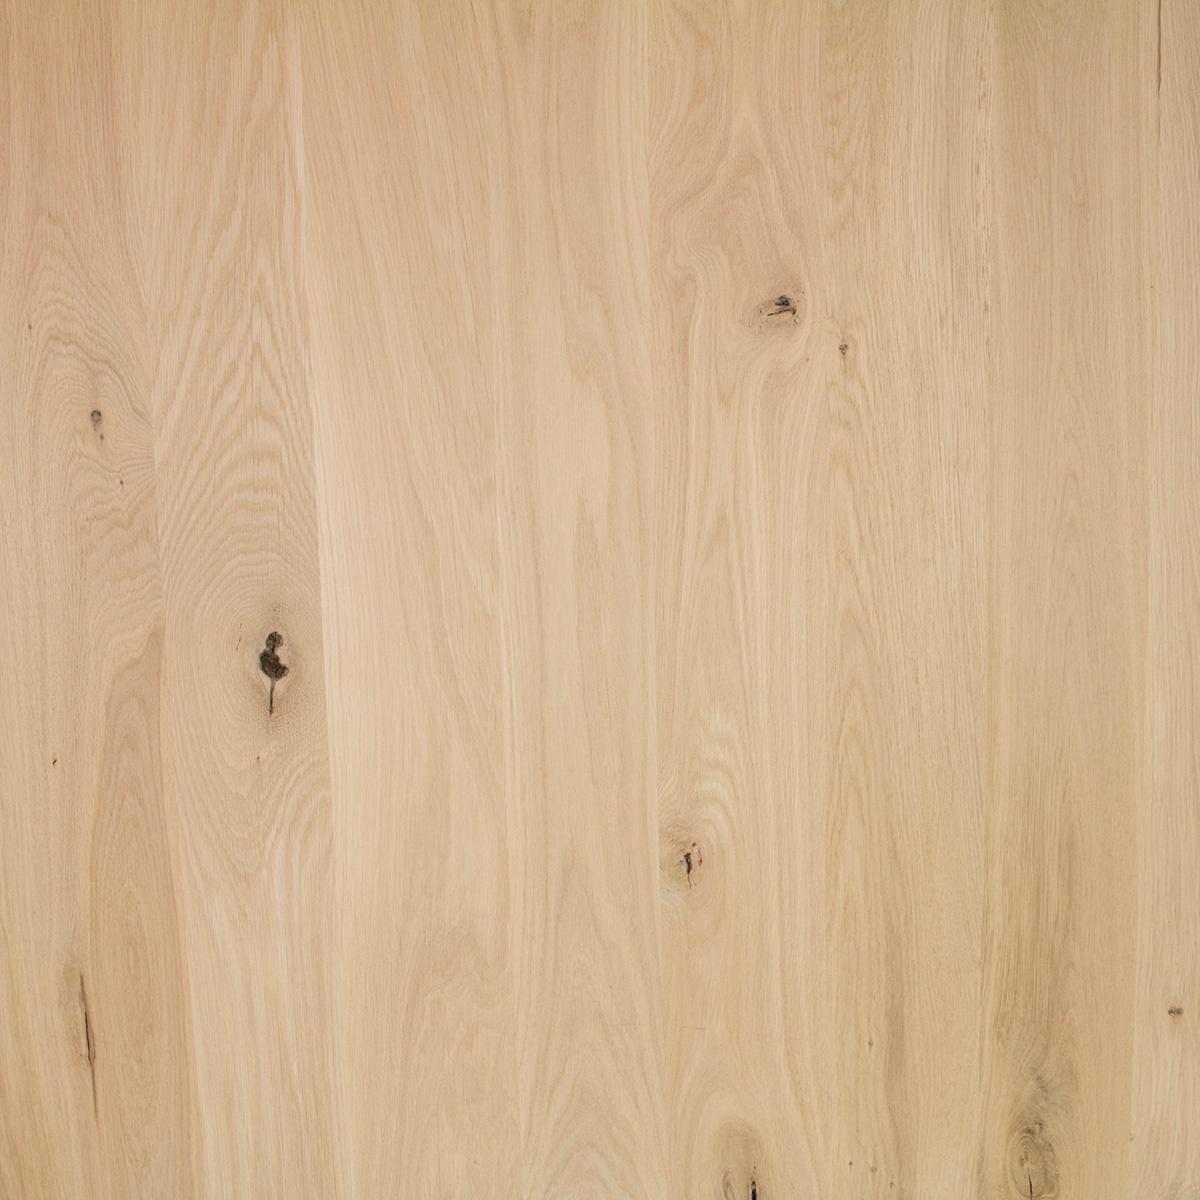 Arbeitsplatte Eiche massiv - 2 cm dick - 122x140-300 cm - Eichenholz rustikal - Massivholz - Verleimt & künstlich getrocknet (HF 8-12%)